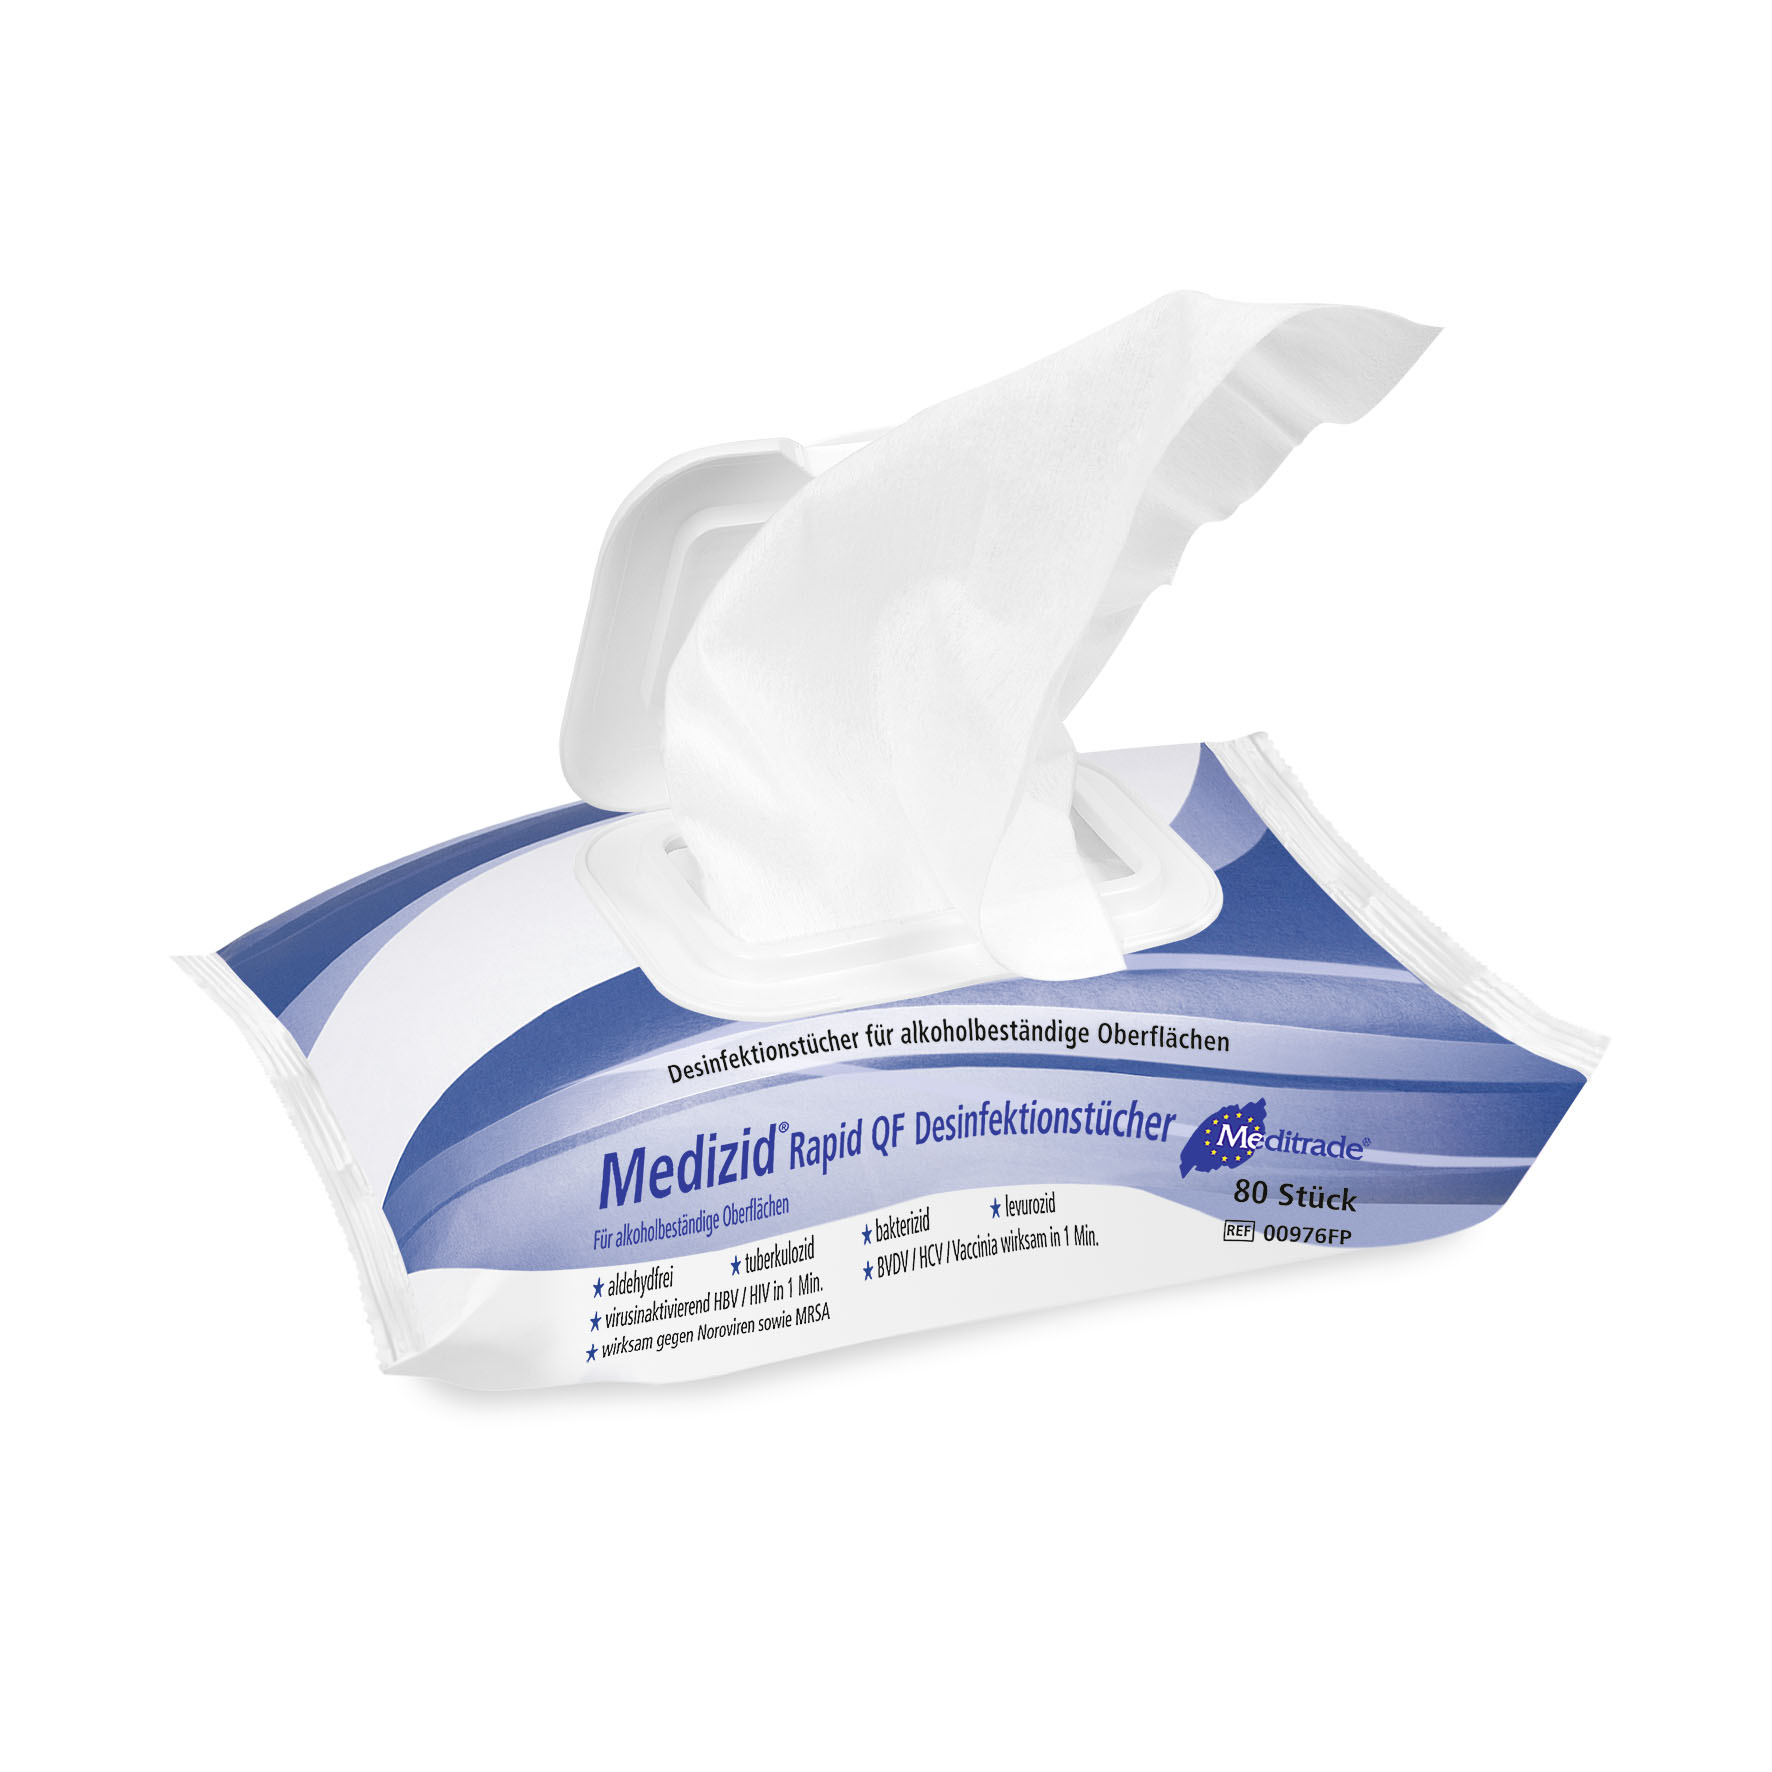 Medizid® Rapid Flowpack